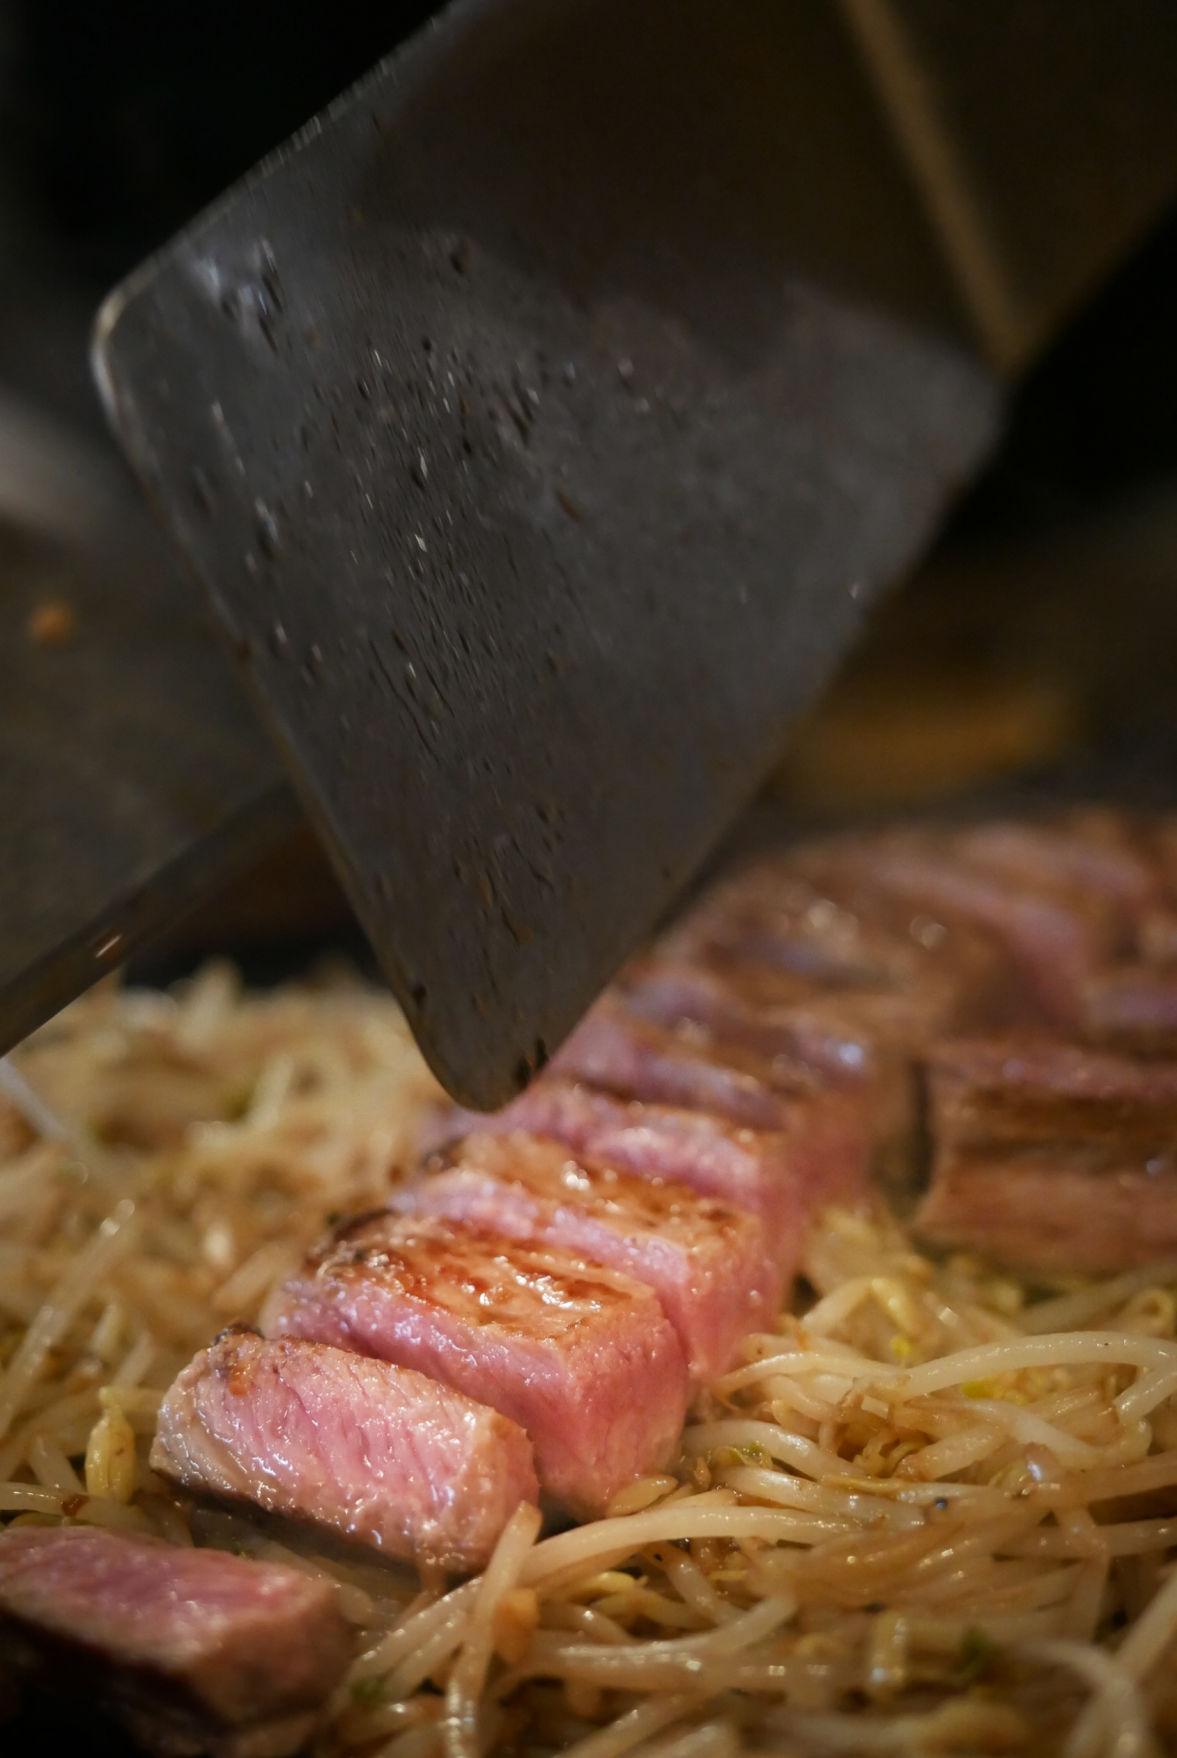 Hot date: Enjoy teppanyaki dinner for two at Shogun